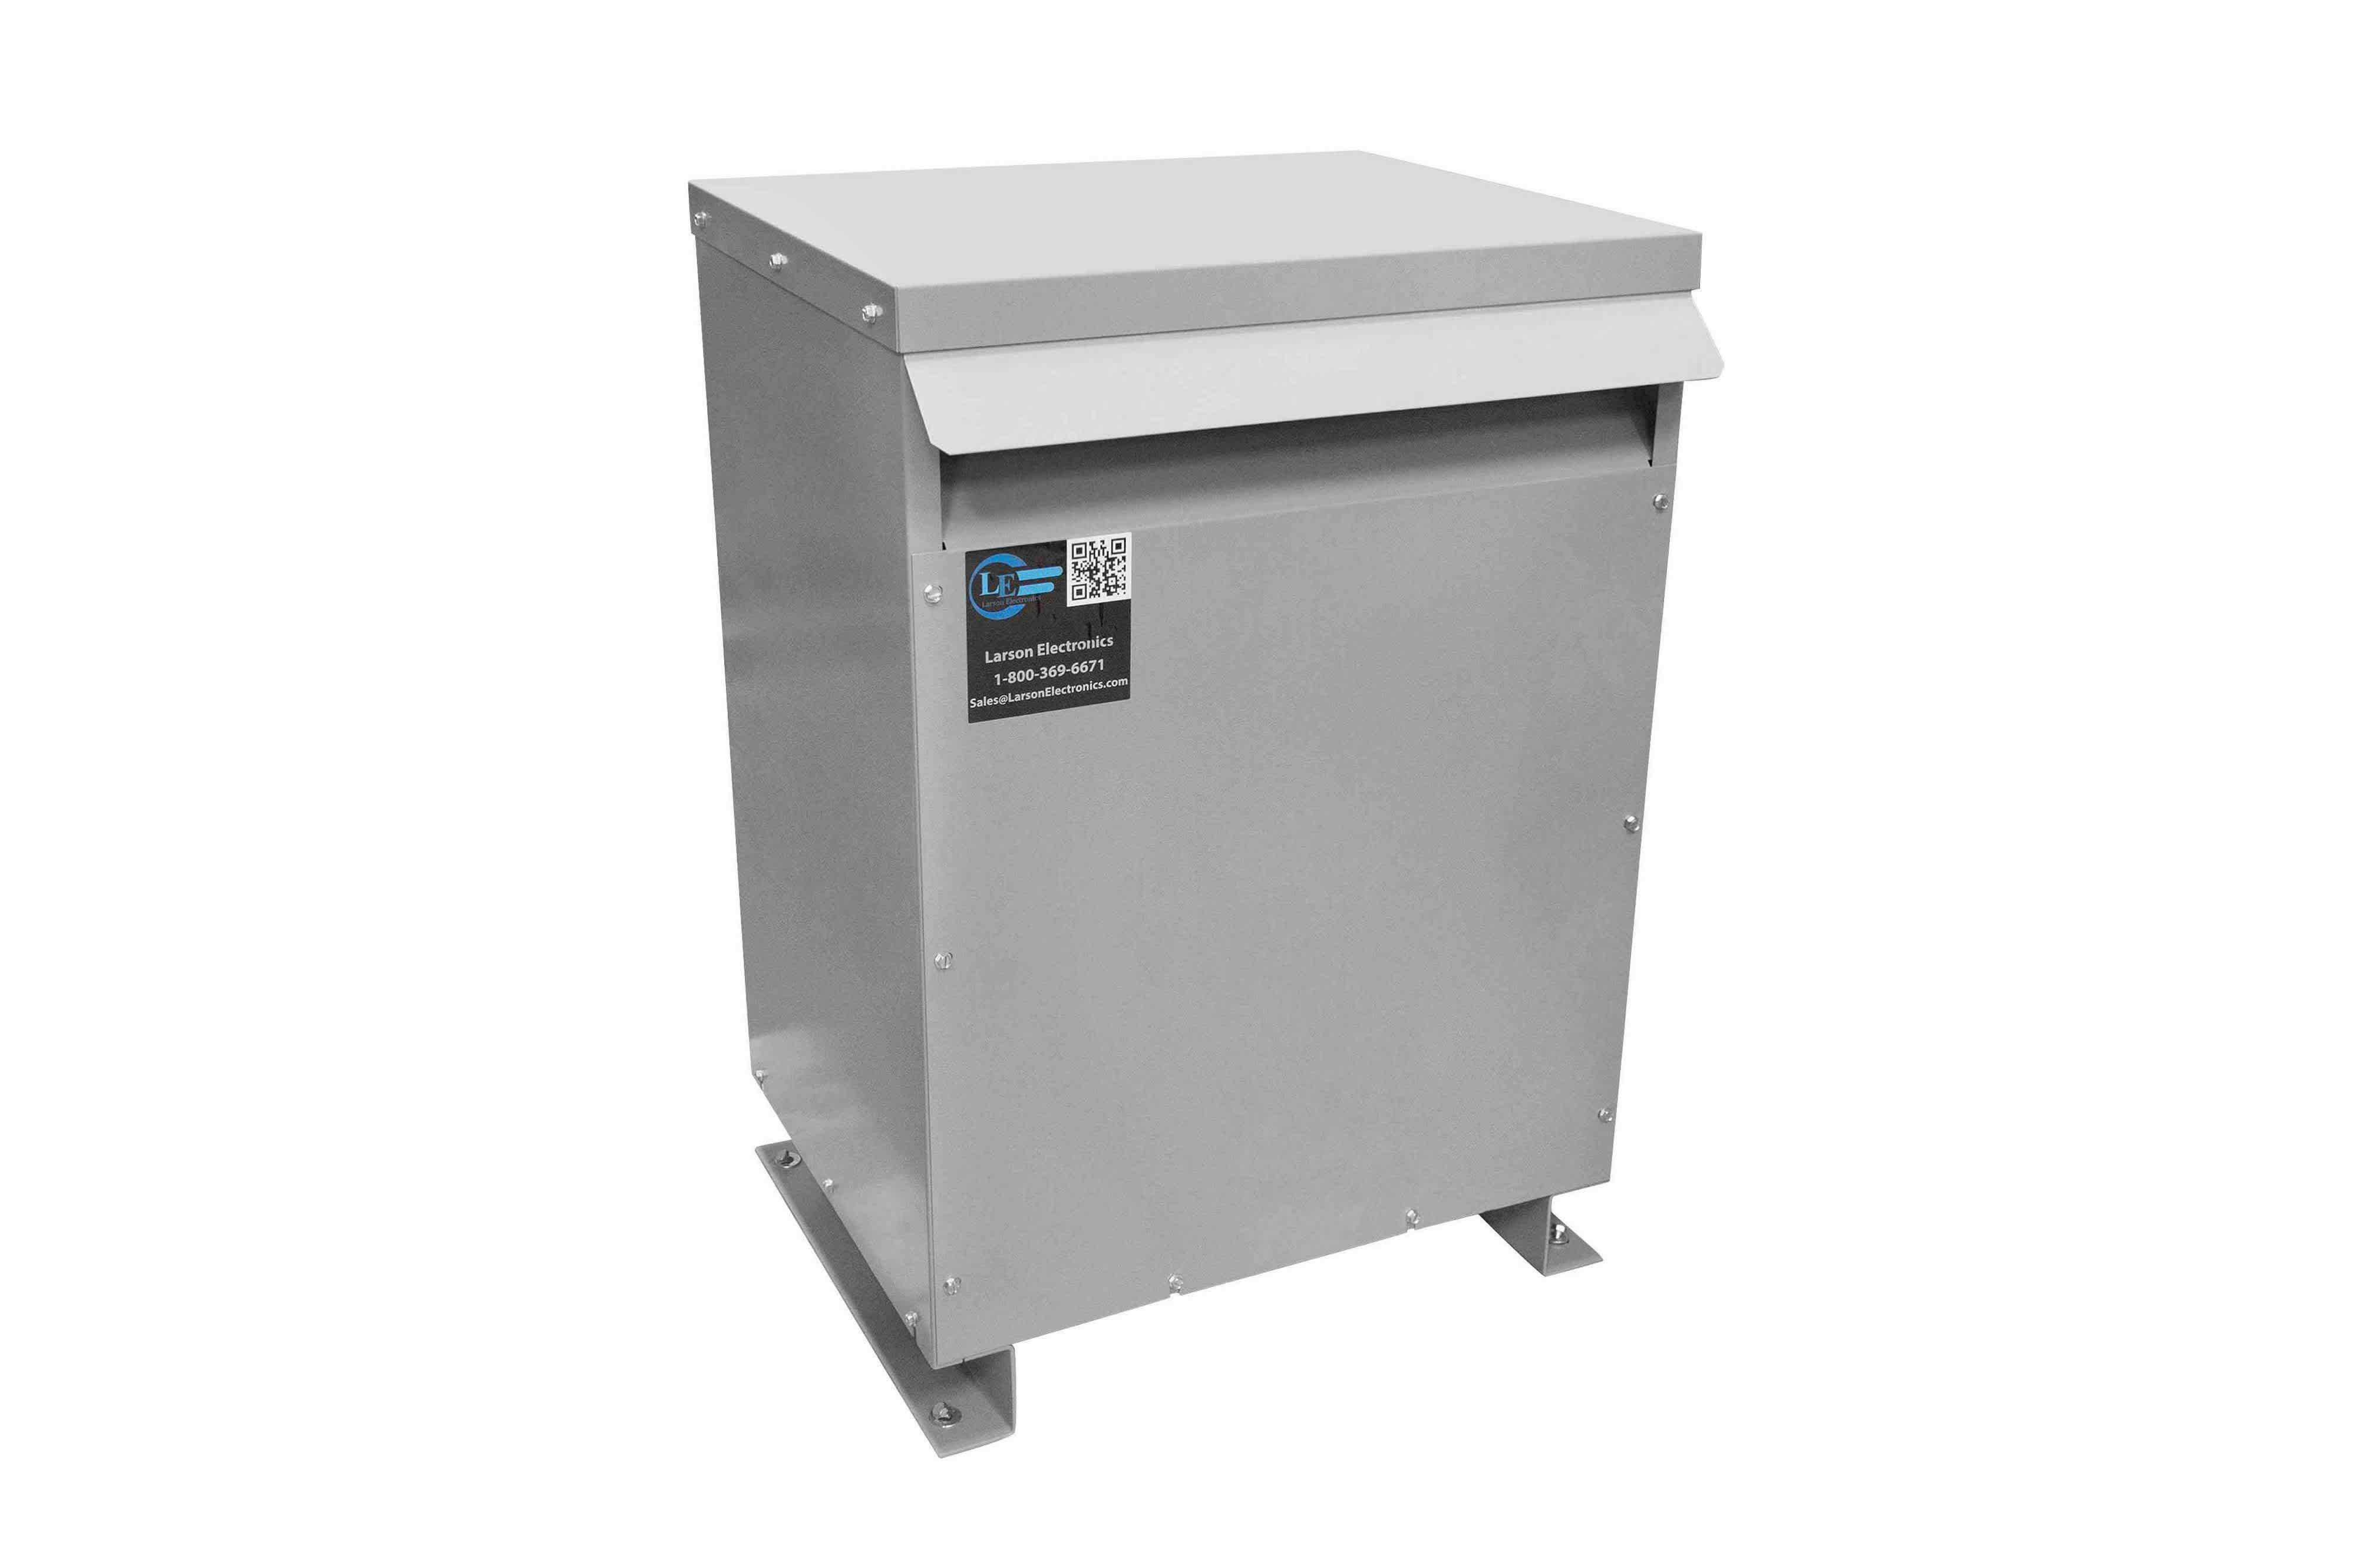 250 kVA 3PH DOE Transformer, 415V Delta Primary, 600Y/347 Wye-N Secondary, N3R, Ventilated, 60 Hz